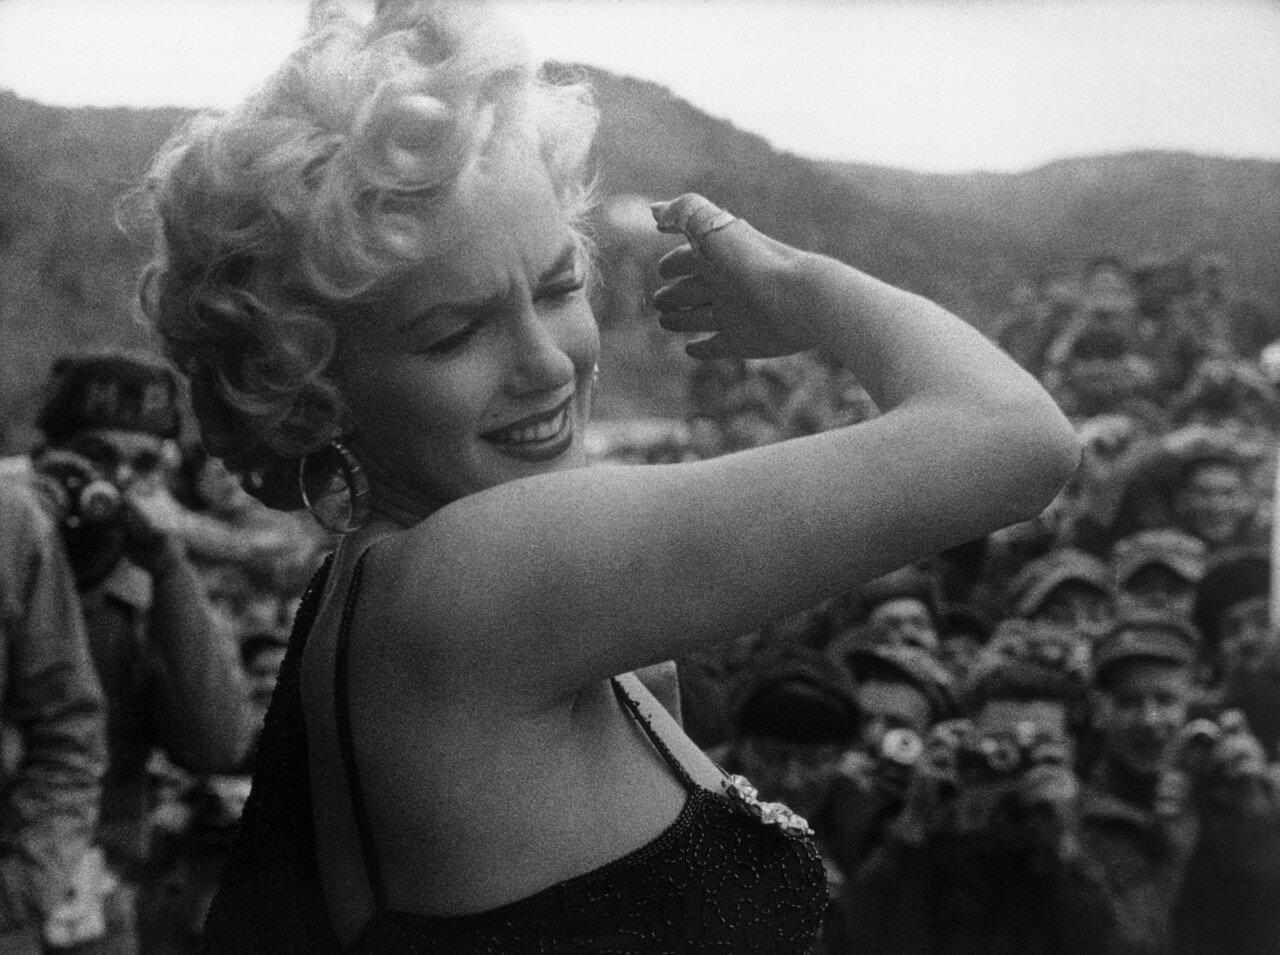 Marilyn Monroe Entertaining the Troops